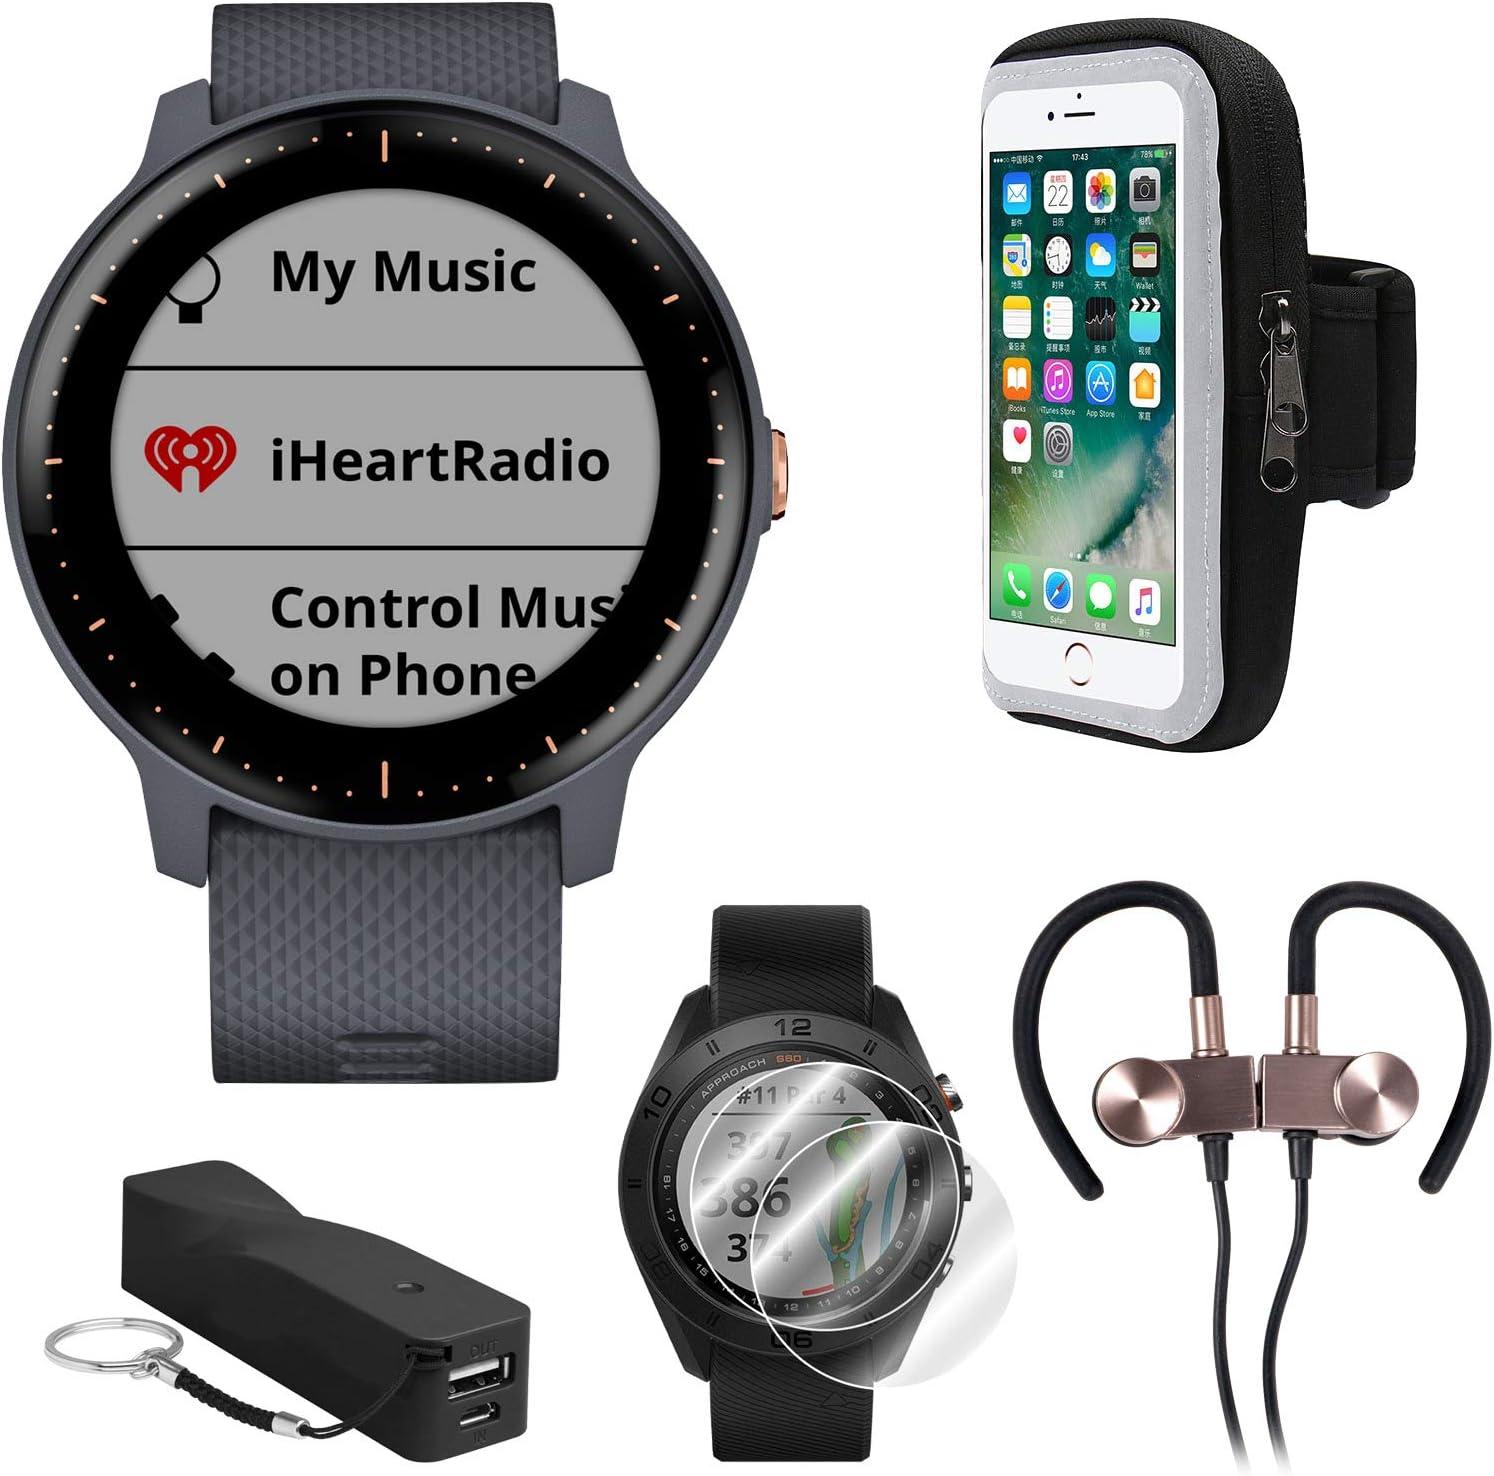 Garmin Vivoactive 3 Music GPS Smartwatch Runner Pro Bundle with Smartphone Armband Holder, Portable Power Bank, 2Pk Screen Protector, and Sport Wireless Earbuds (Black & Gunmetal): Amazon.es: Electrónica